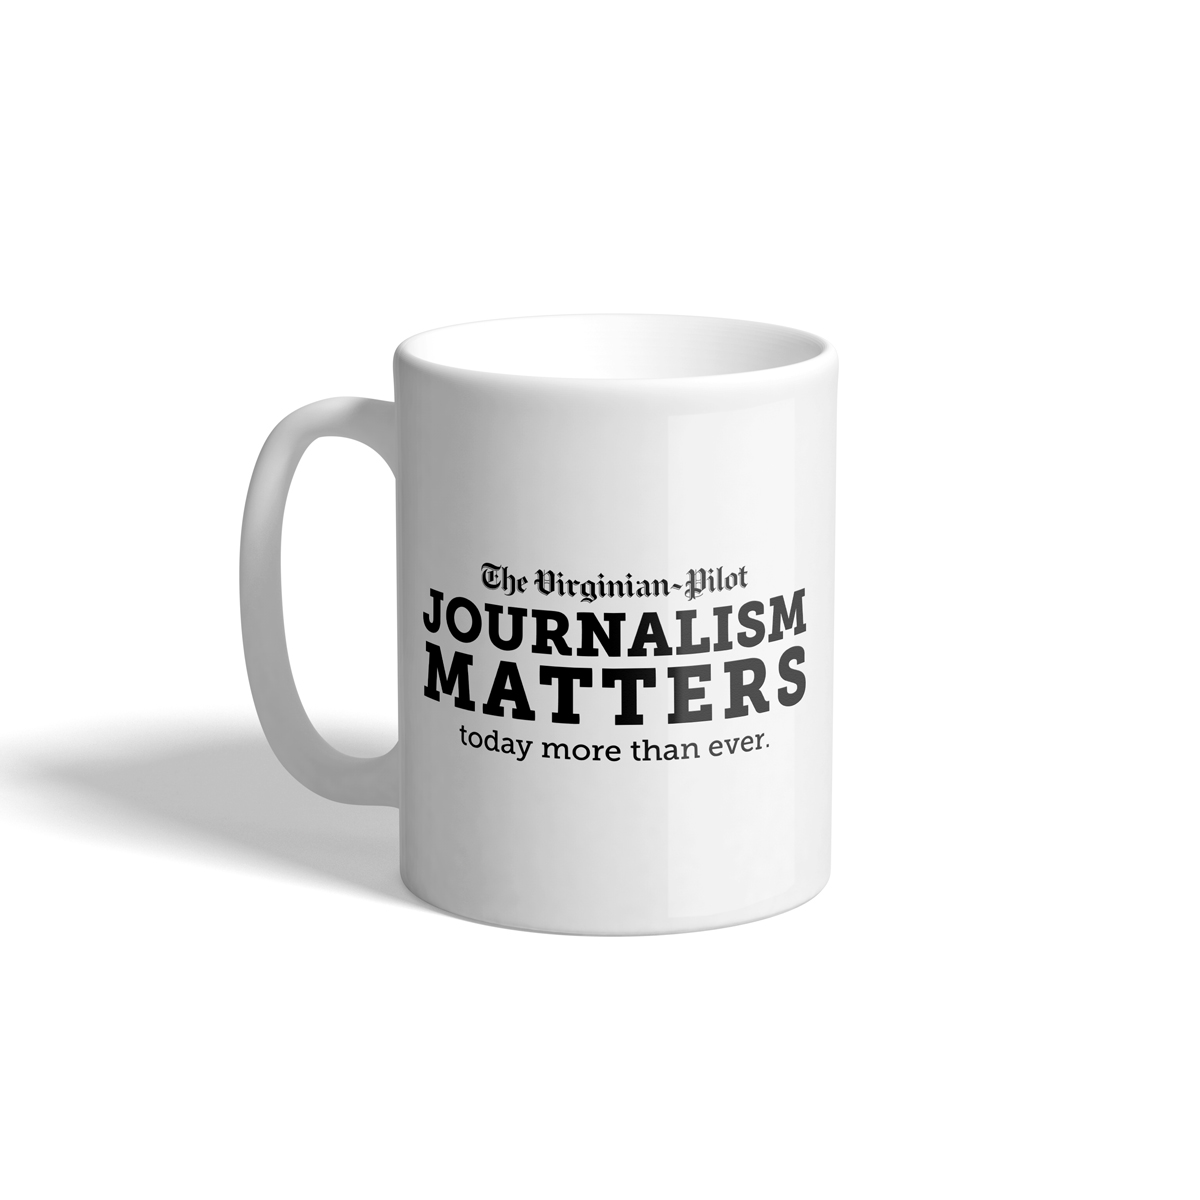 Pilot Journalism Matters Mug